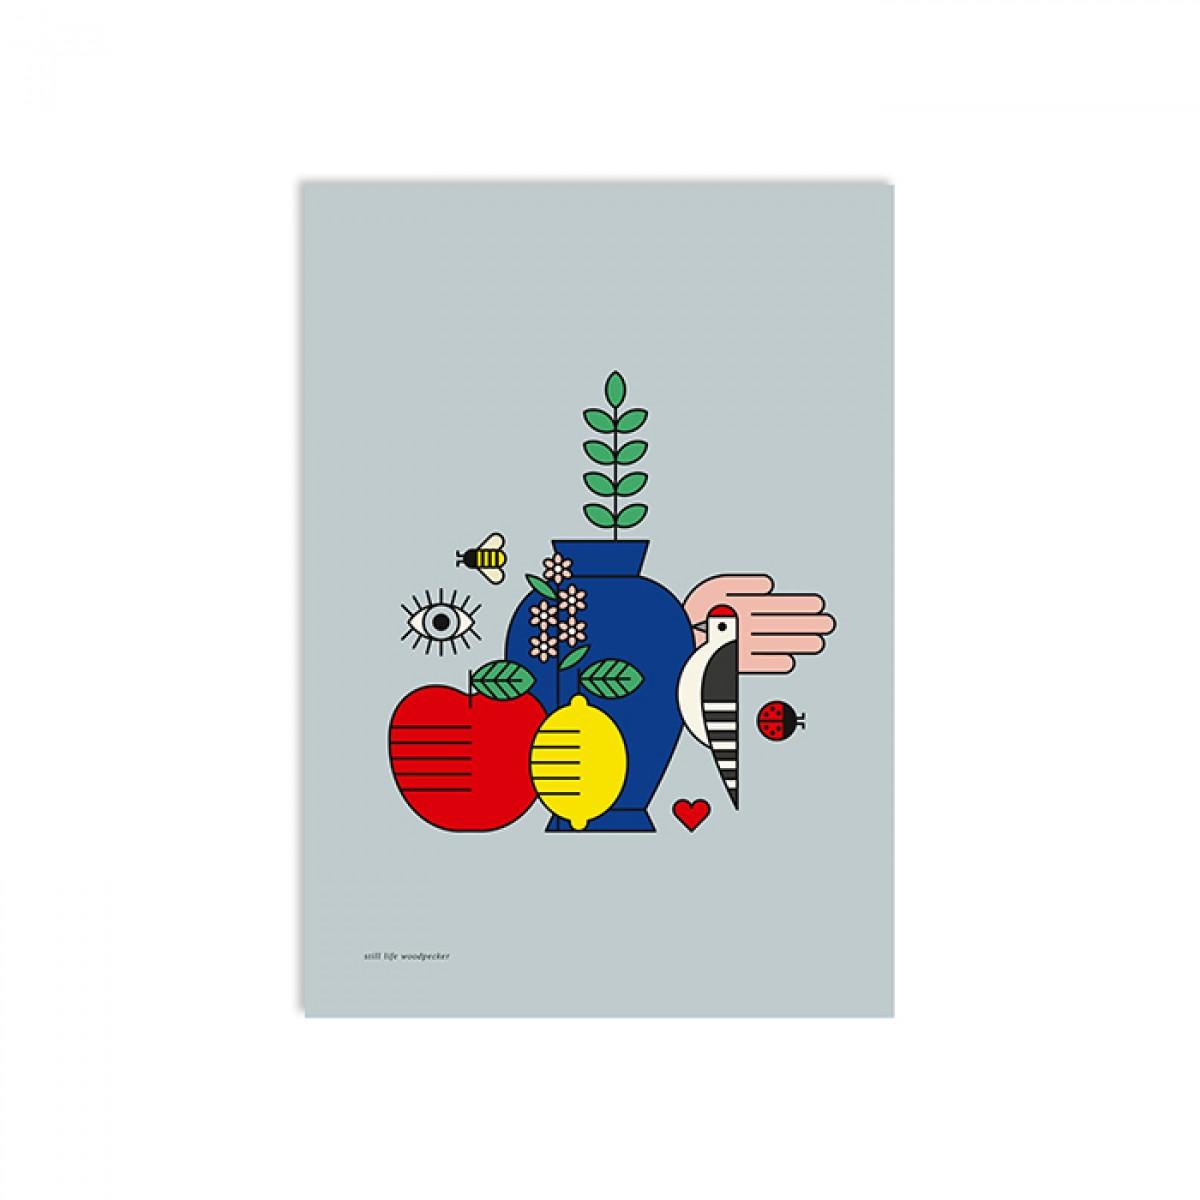 redfries still life woodpecker a3 – Kunstdruck DIN A3